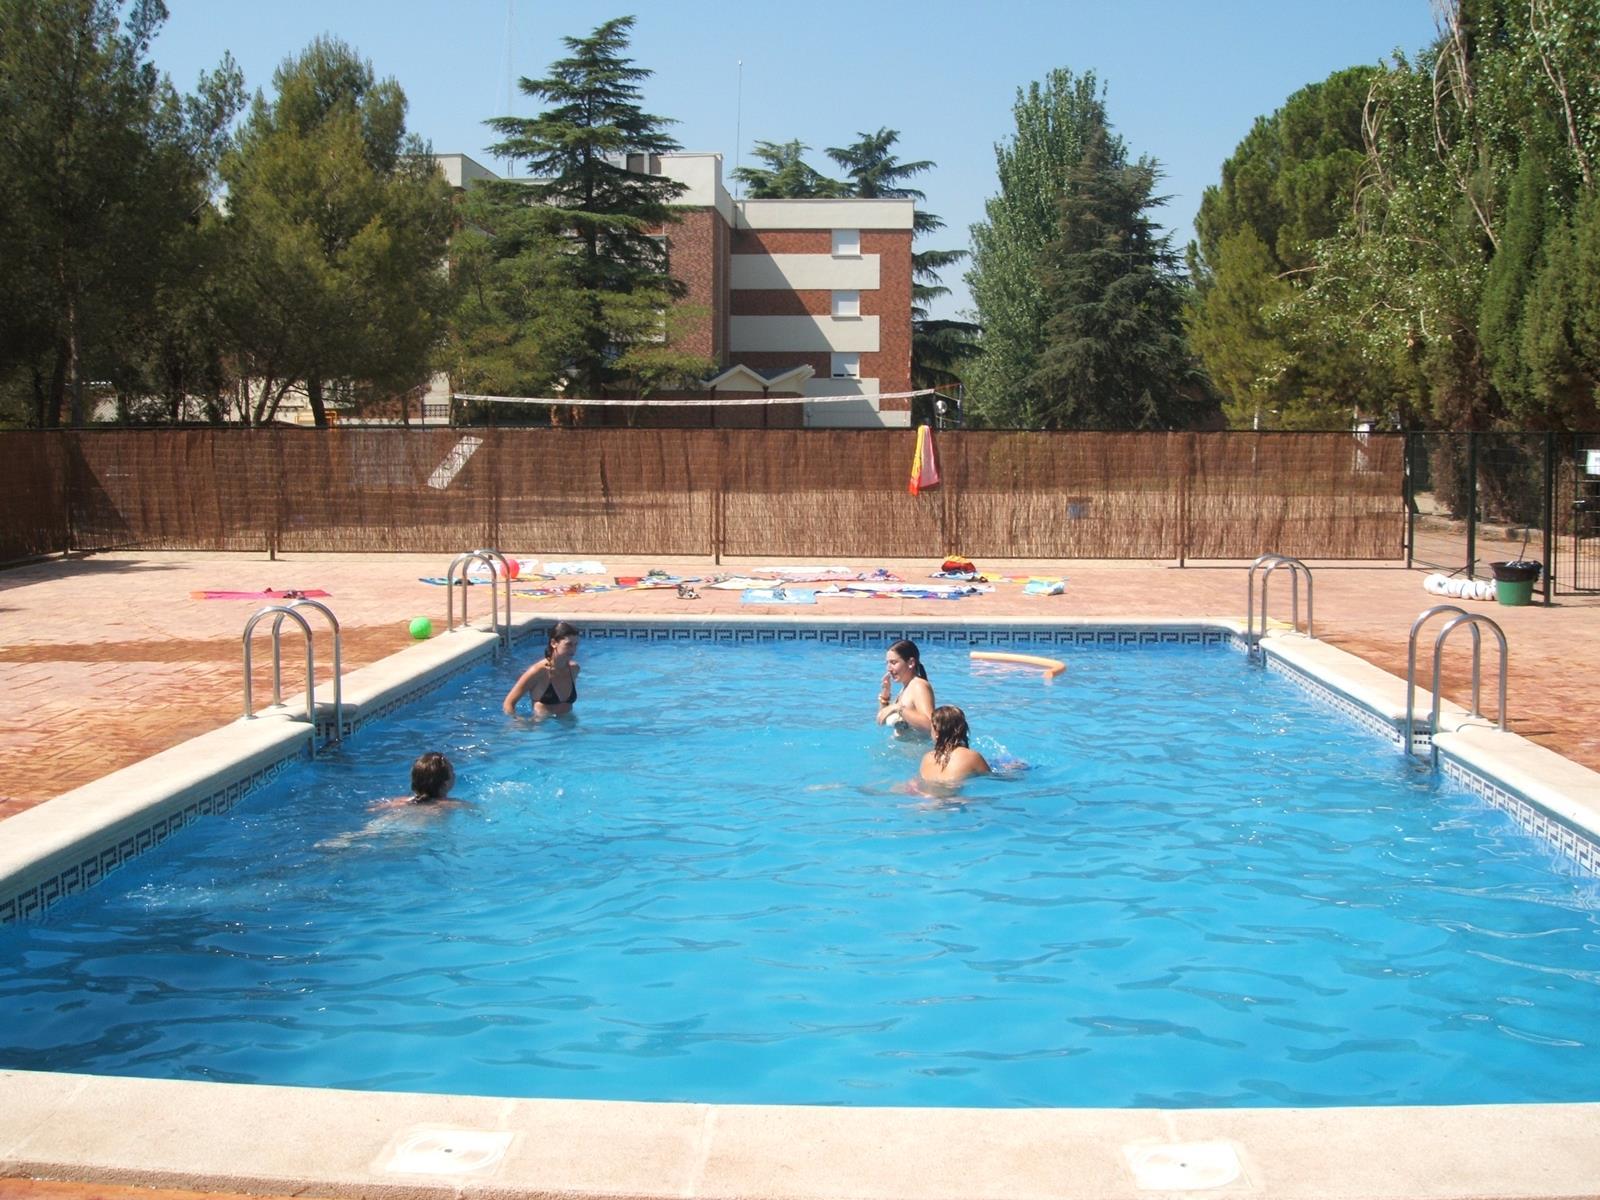 Residencia Universitaria Cardenal Cisneros. pool